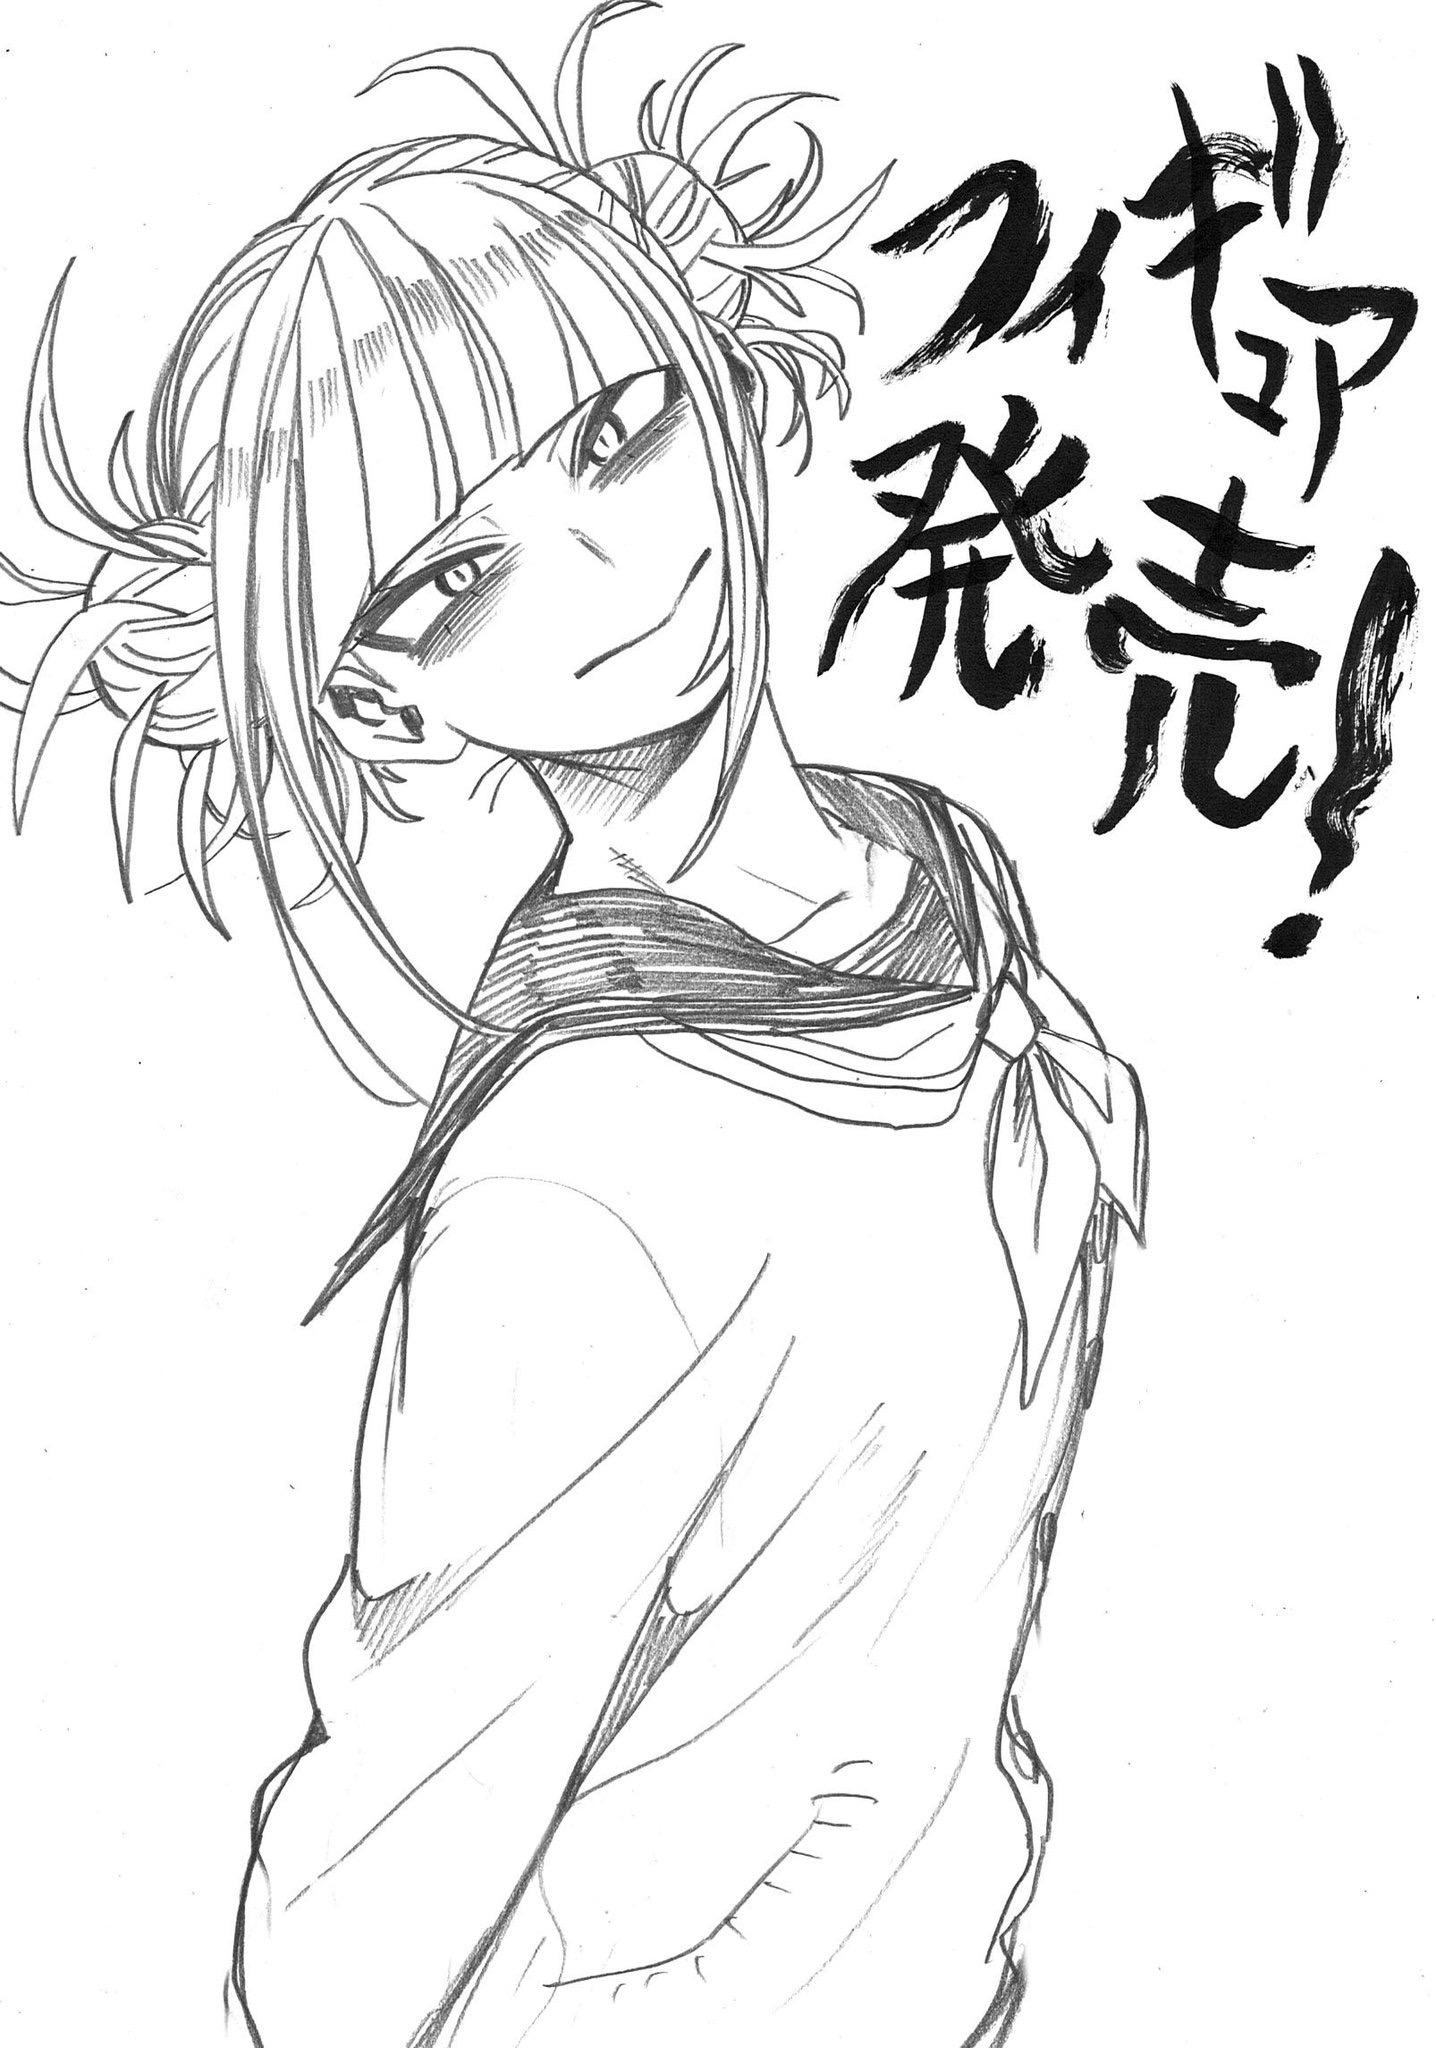 Himiko Toga Thank You Horikoshi sketch